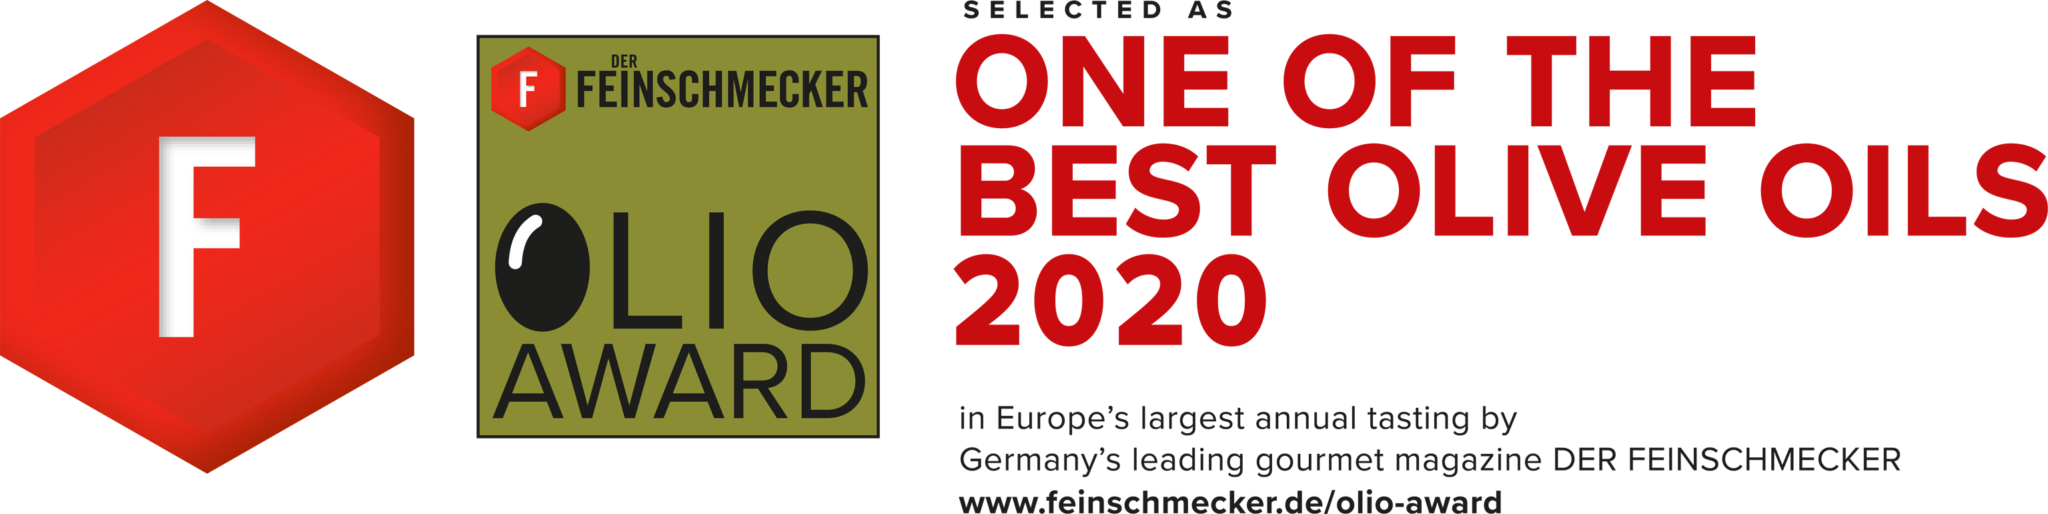 DER FEINSCHMECKER Congratulations Olio Award